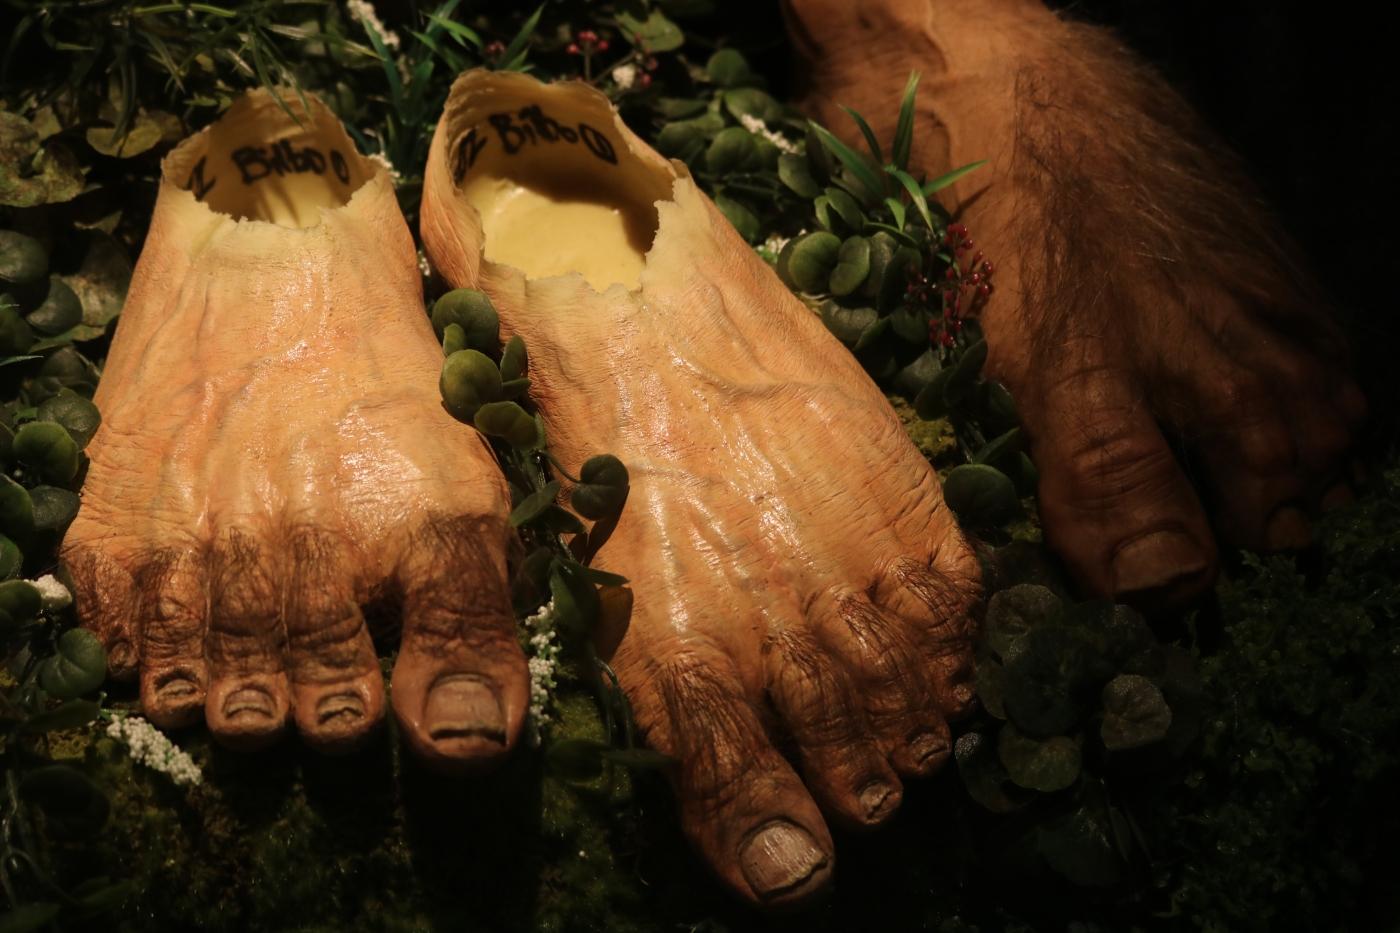 Prosthetic hobbit feet at the Weta Cave, Wellington.